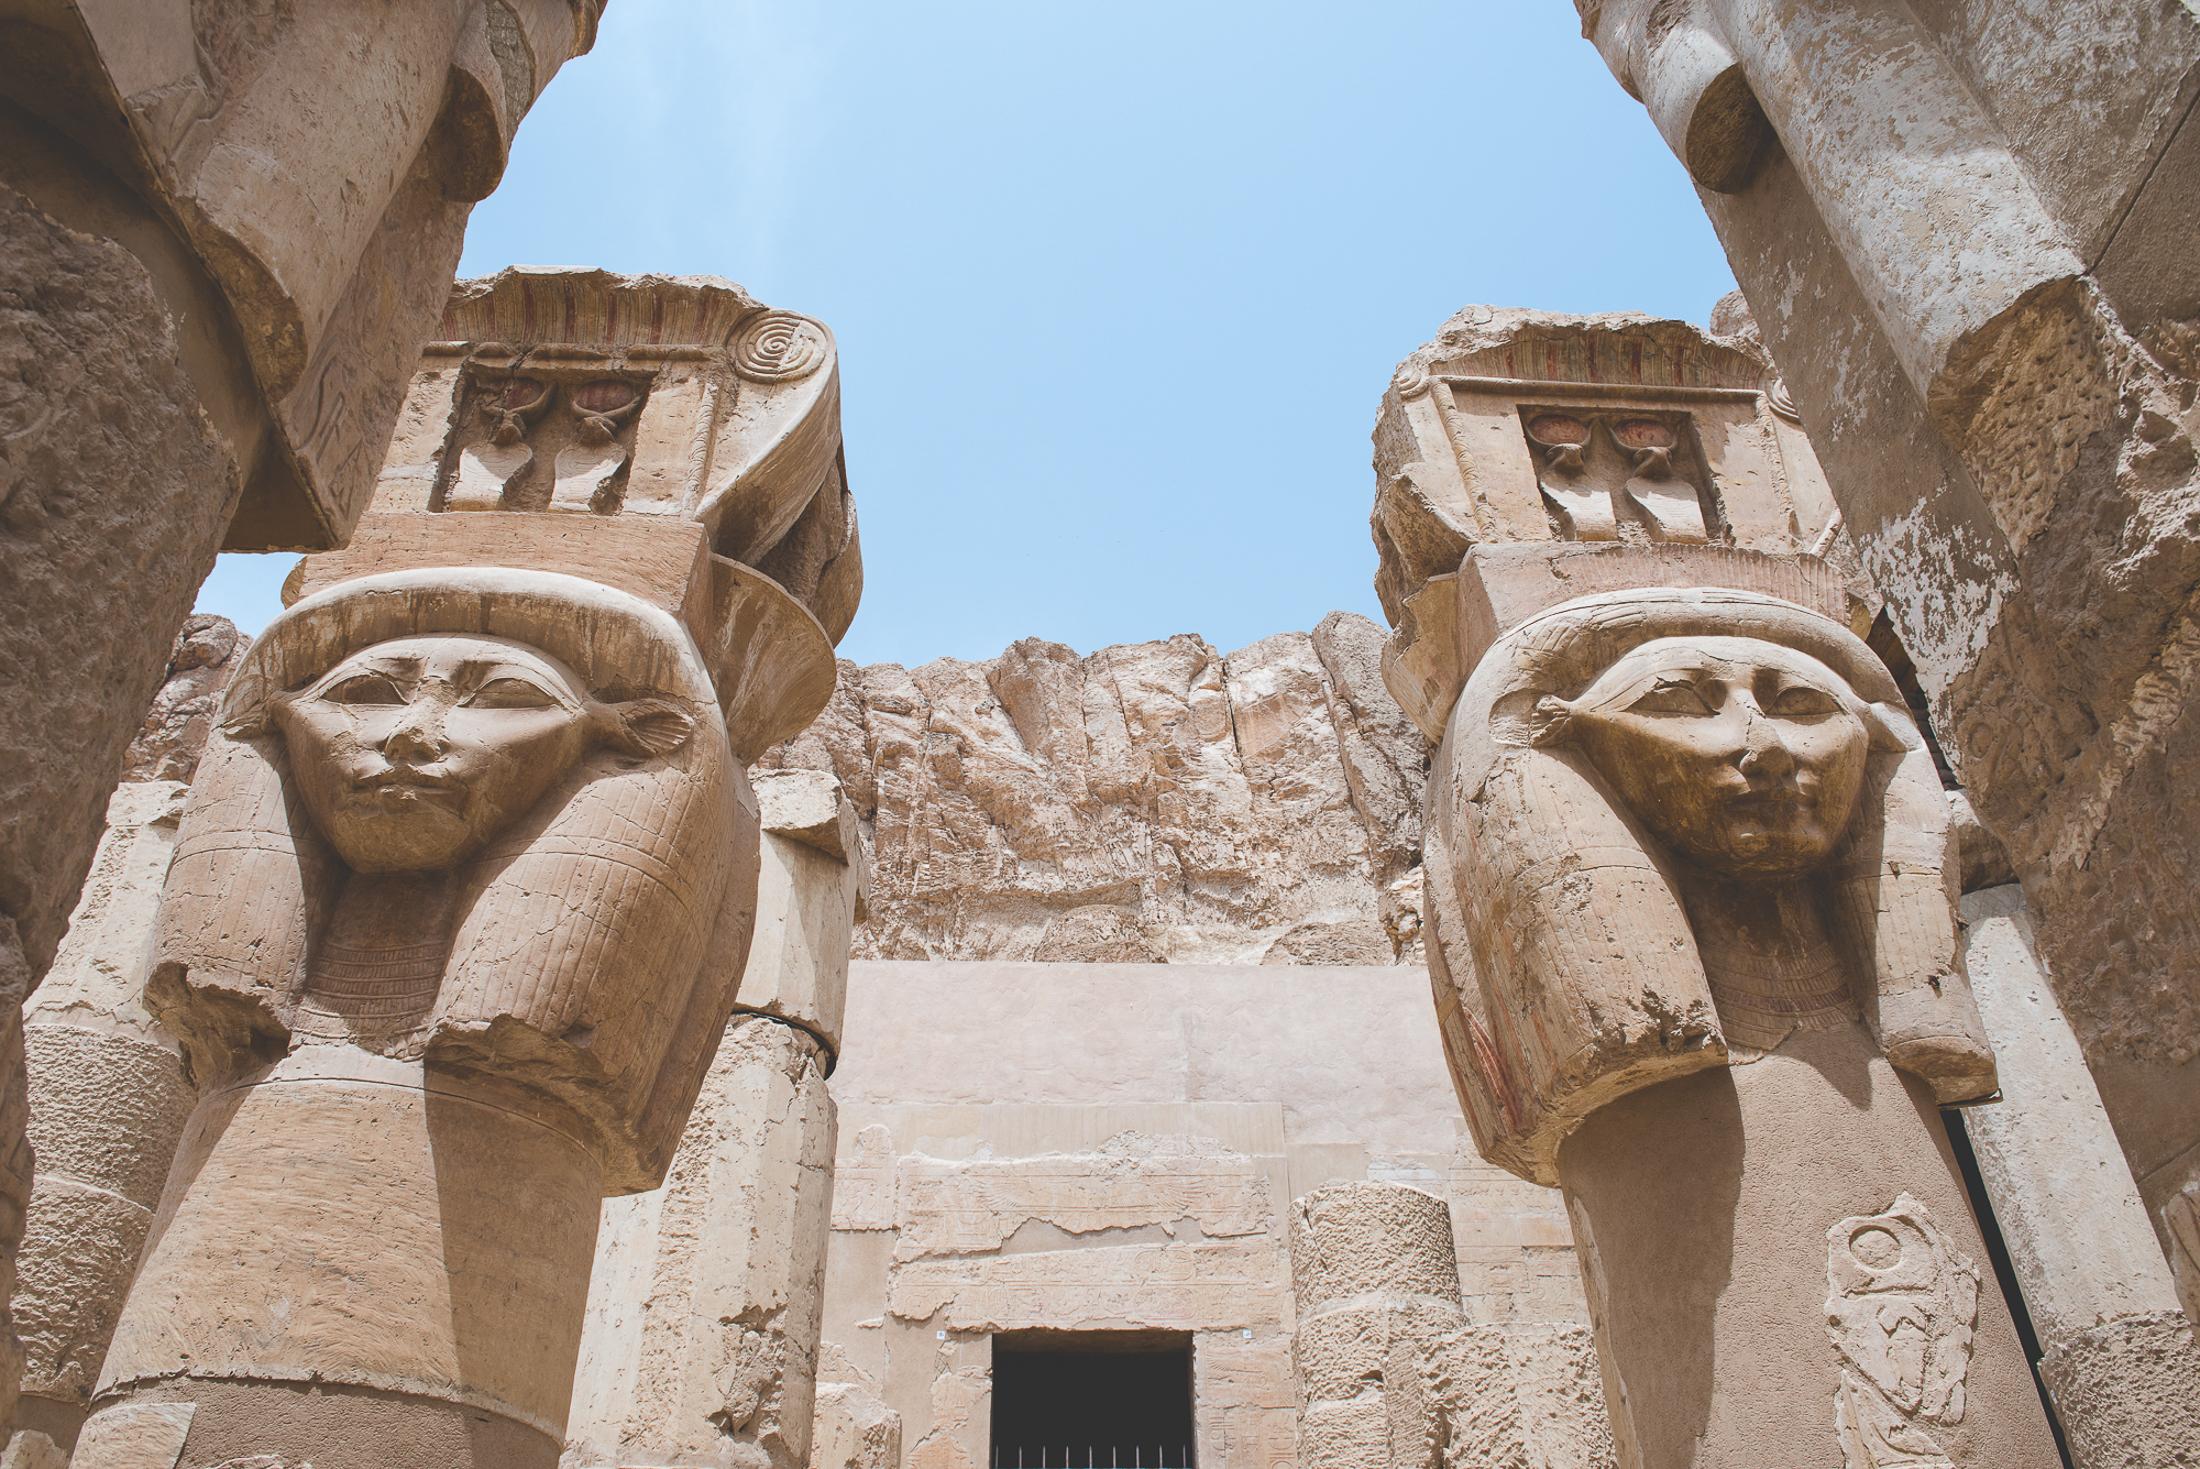 thetravelhub_egypt38.jpg